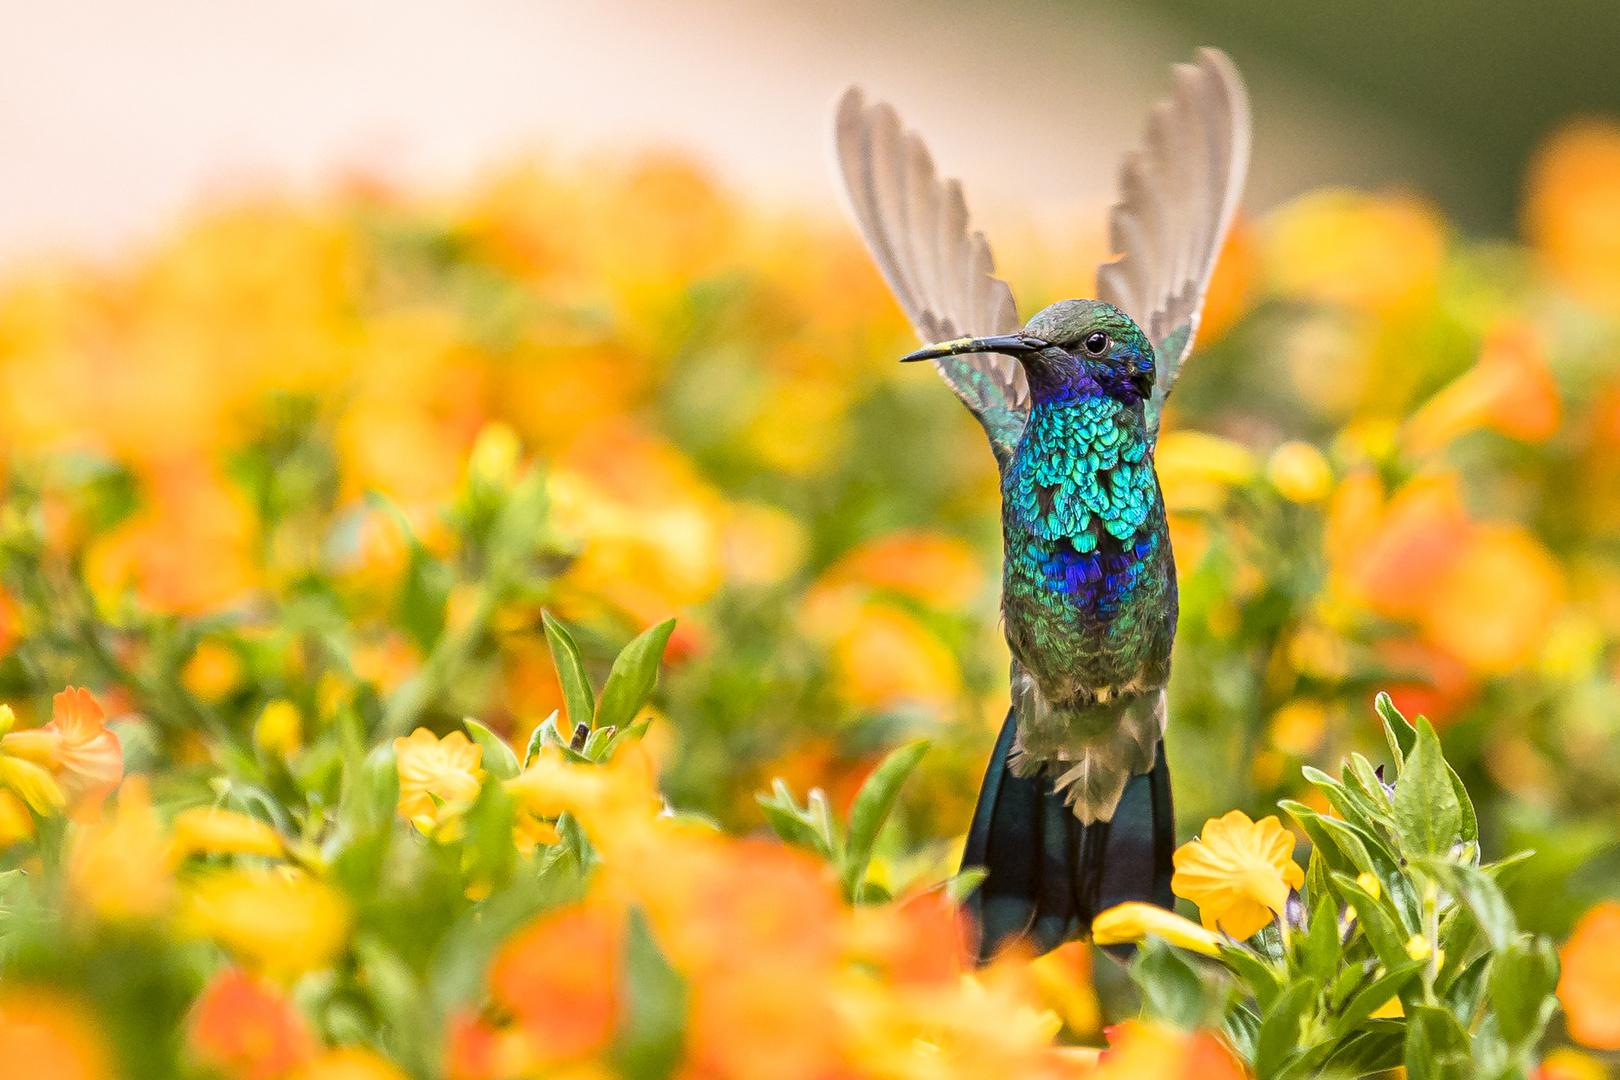 триммер партнер колибри 2